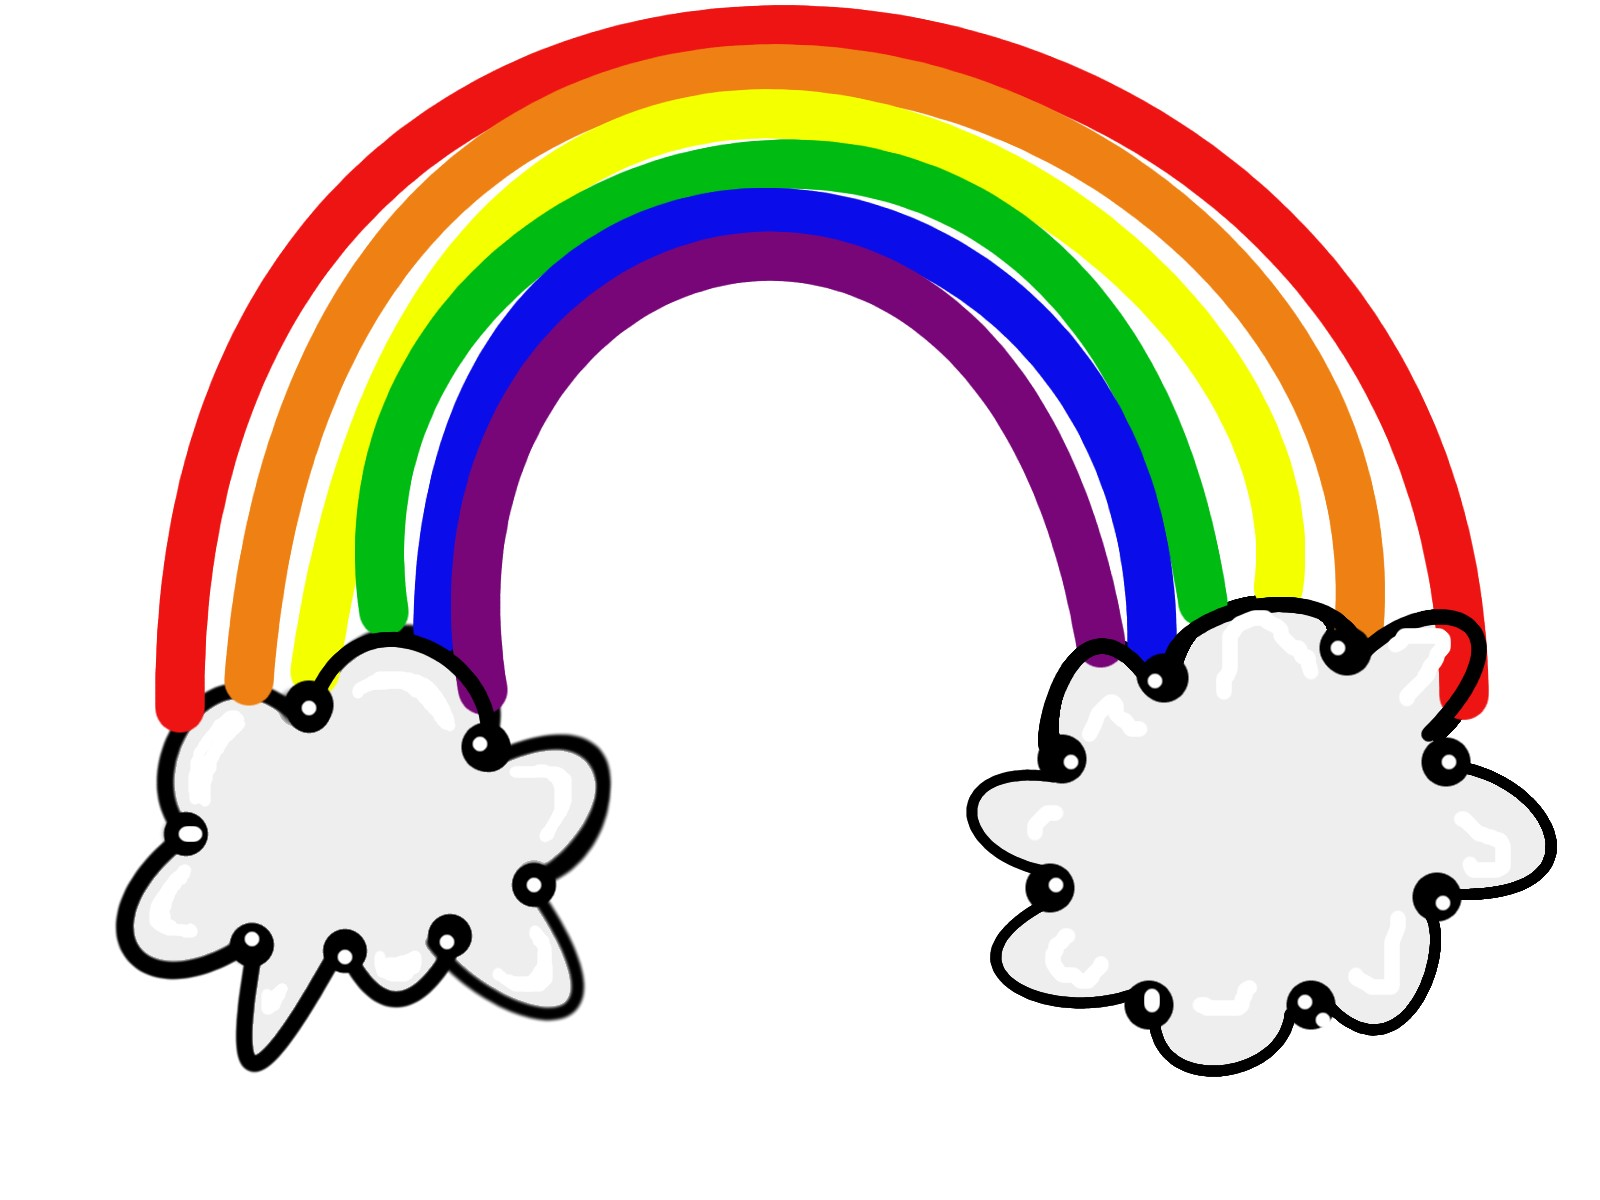 1600x1200 Free Rainbow Clip Art Pictures